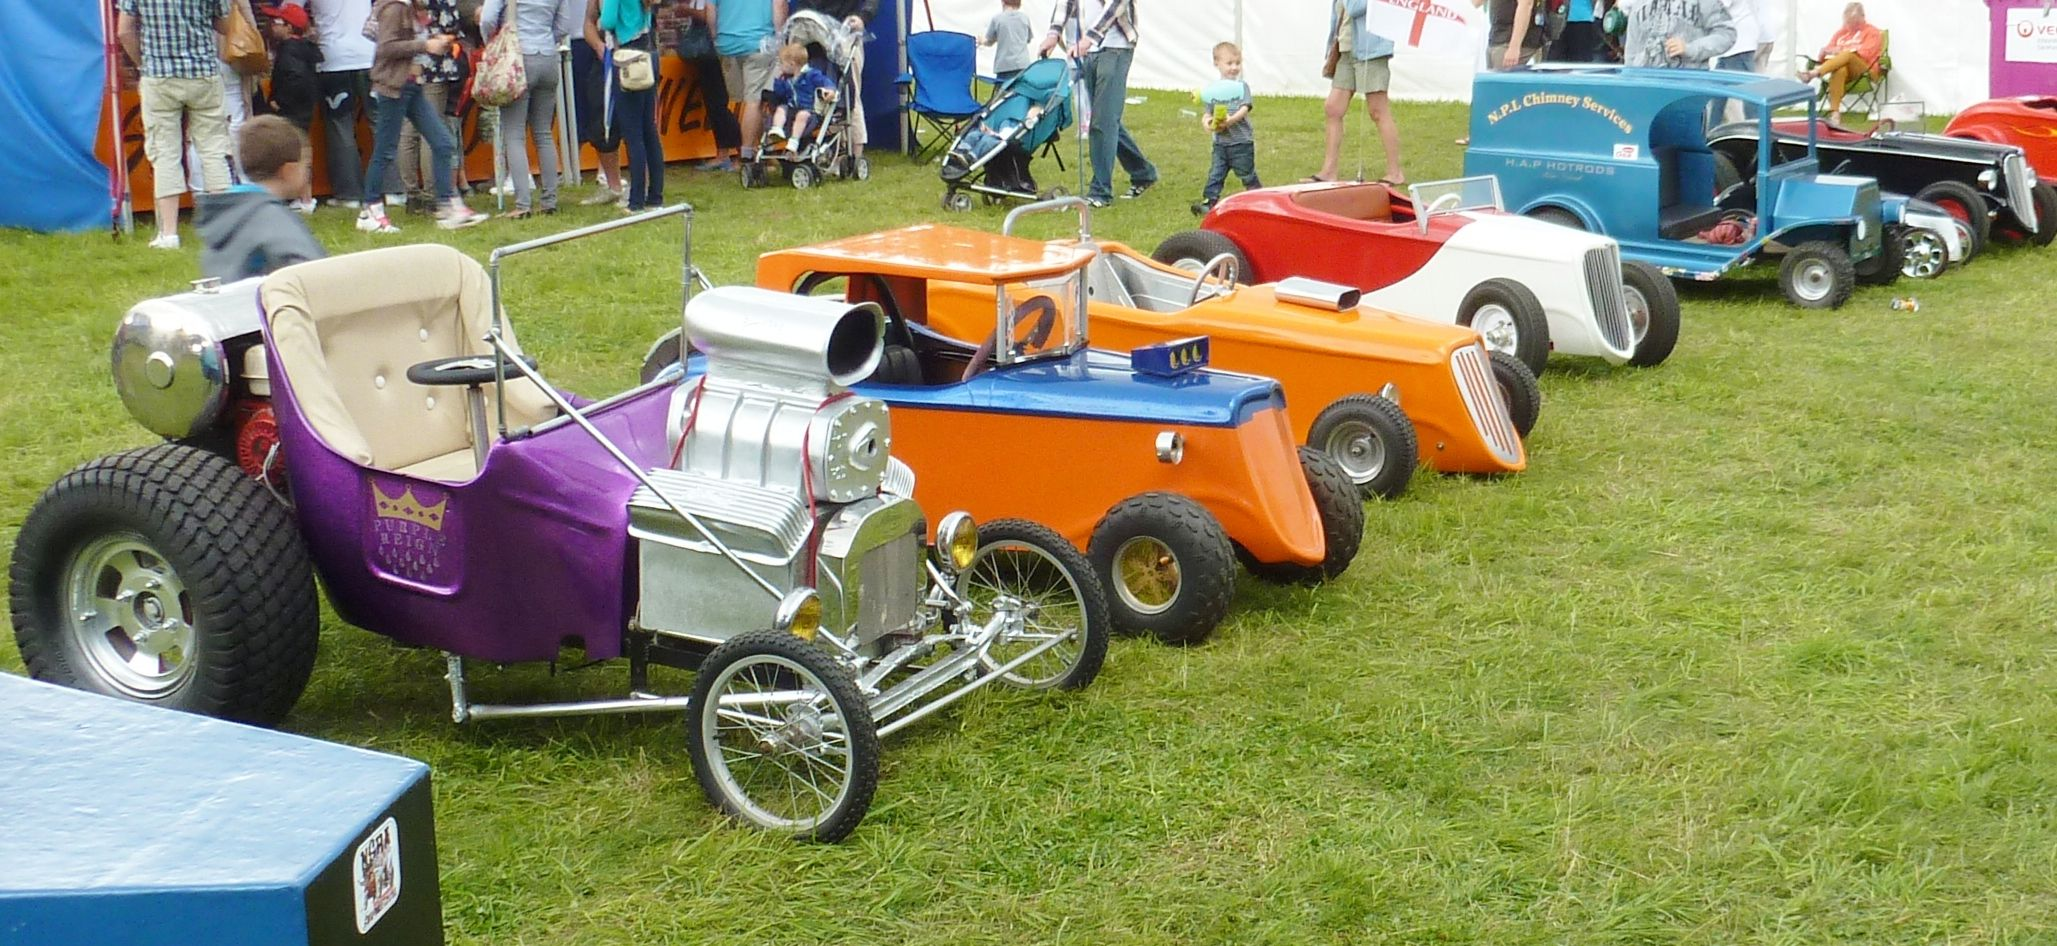 Hot Rods Wedding 011 Jpg 2057 215 946 Cars And Trucks